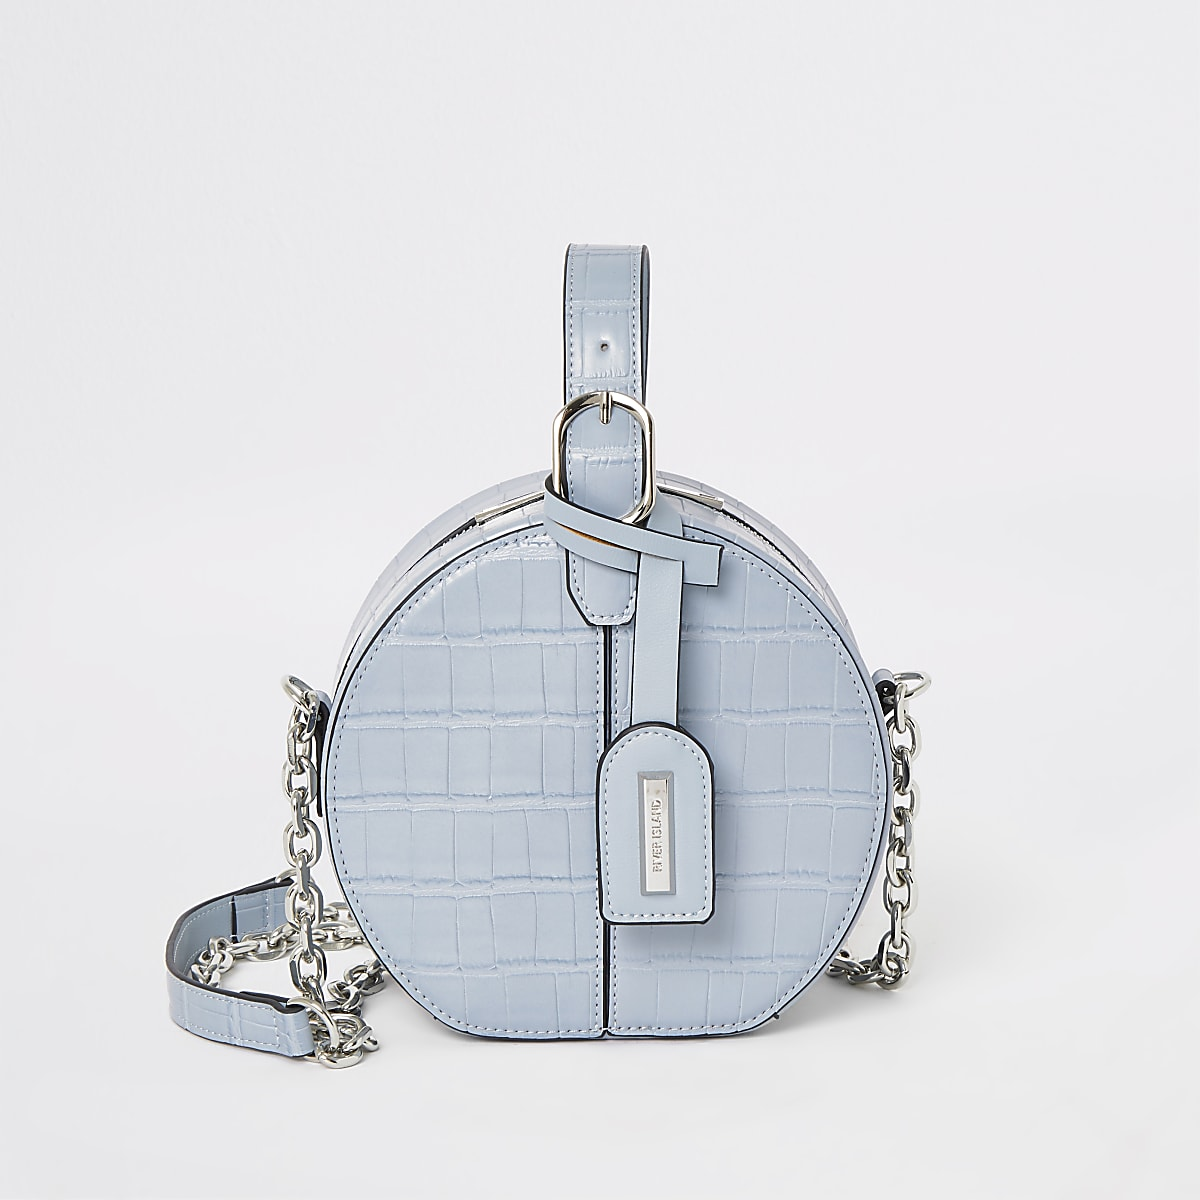 Sac bandoulière bleu croco style vanity